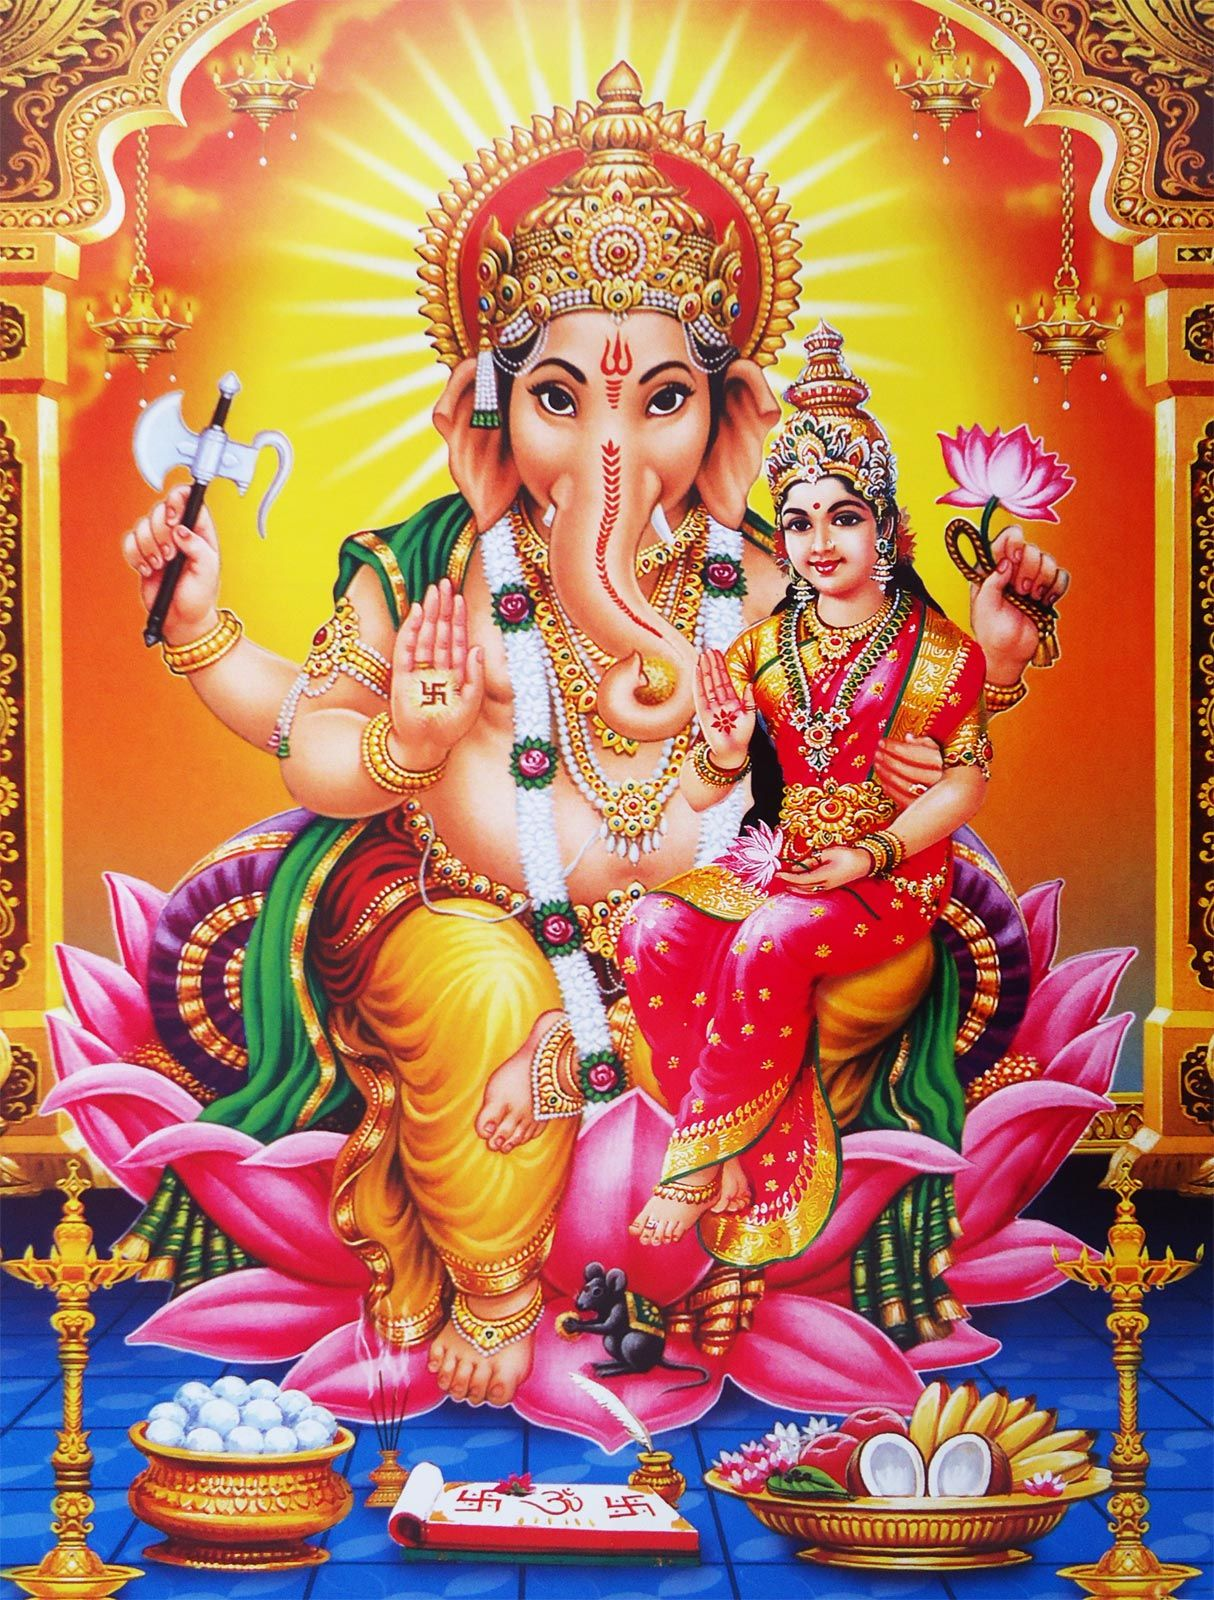 Lord Ganesha Happy ganesh chaturthi images, Ganesh